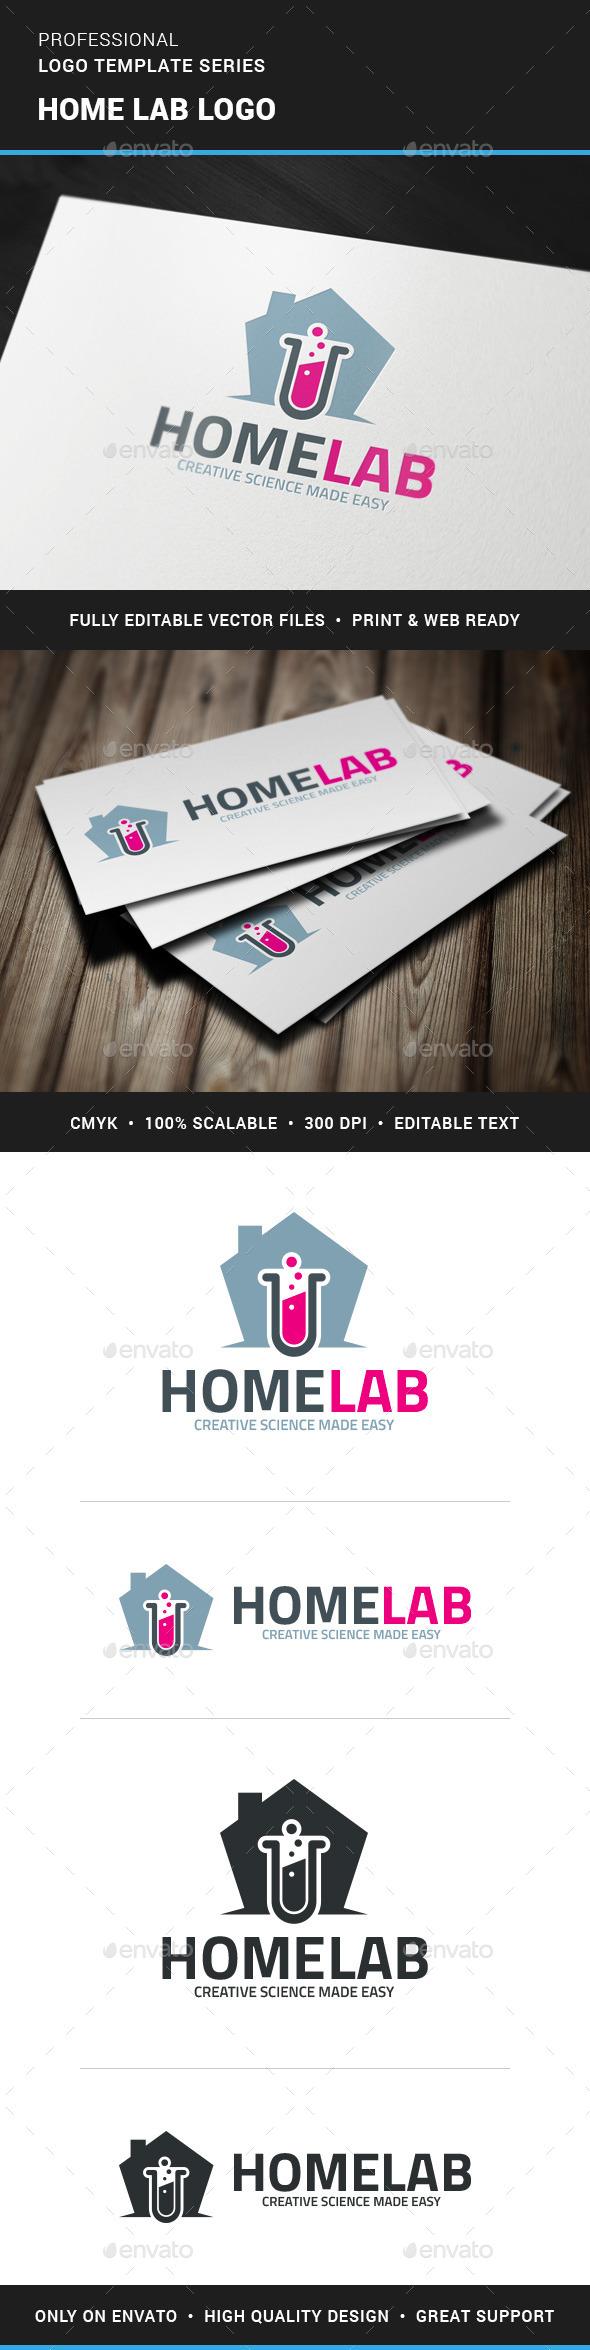 GraphicRiver Home Lab Logo Template 11767487